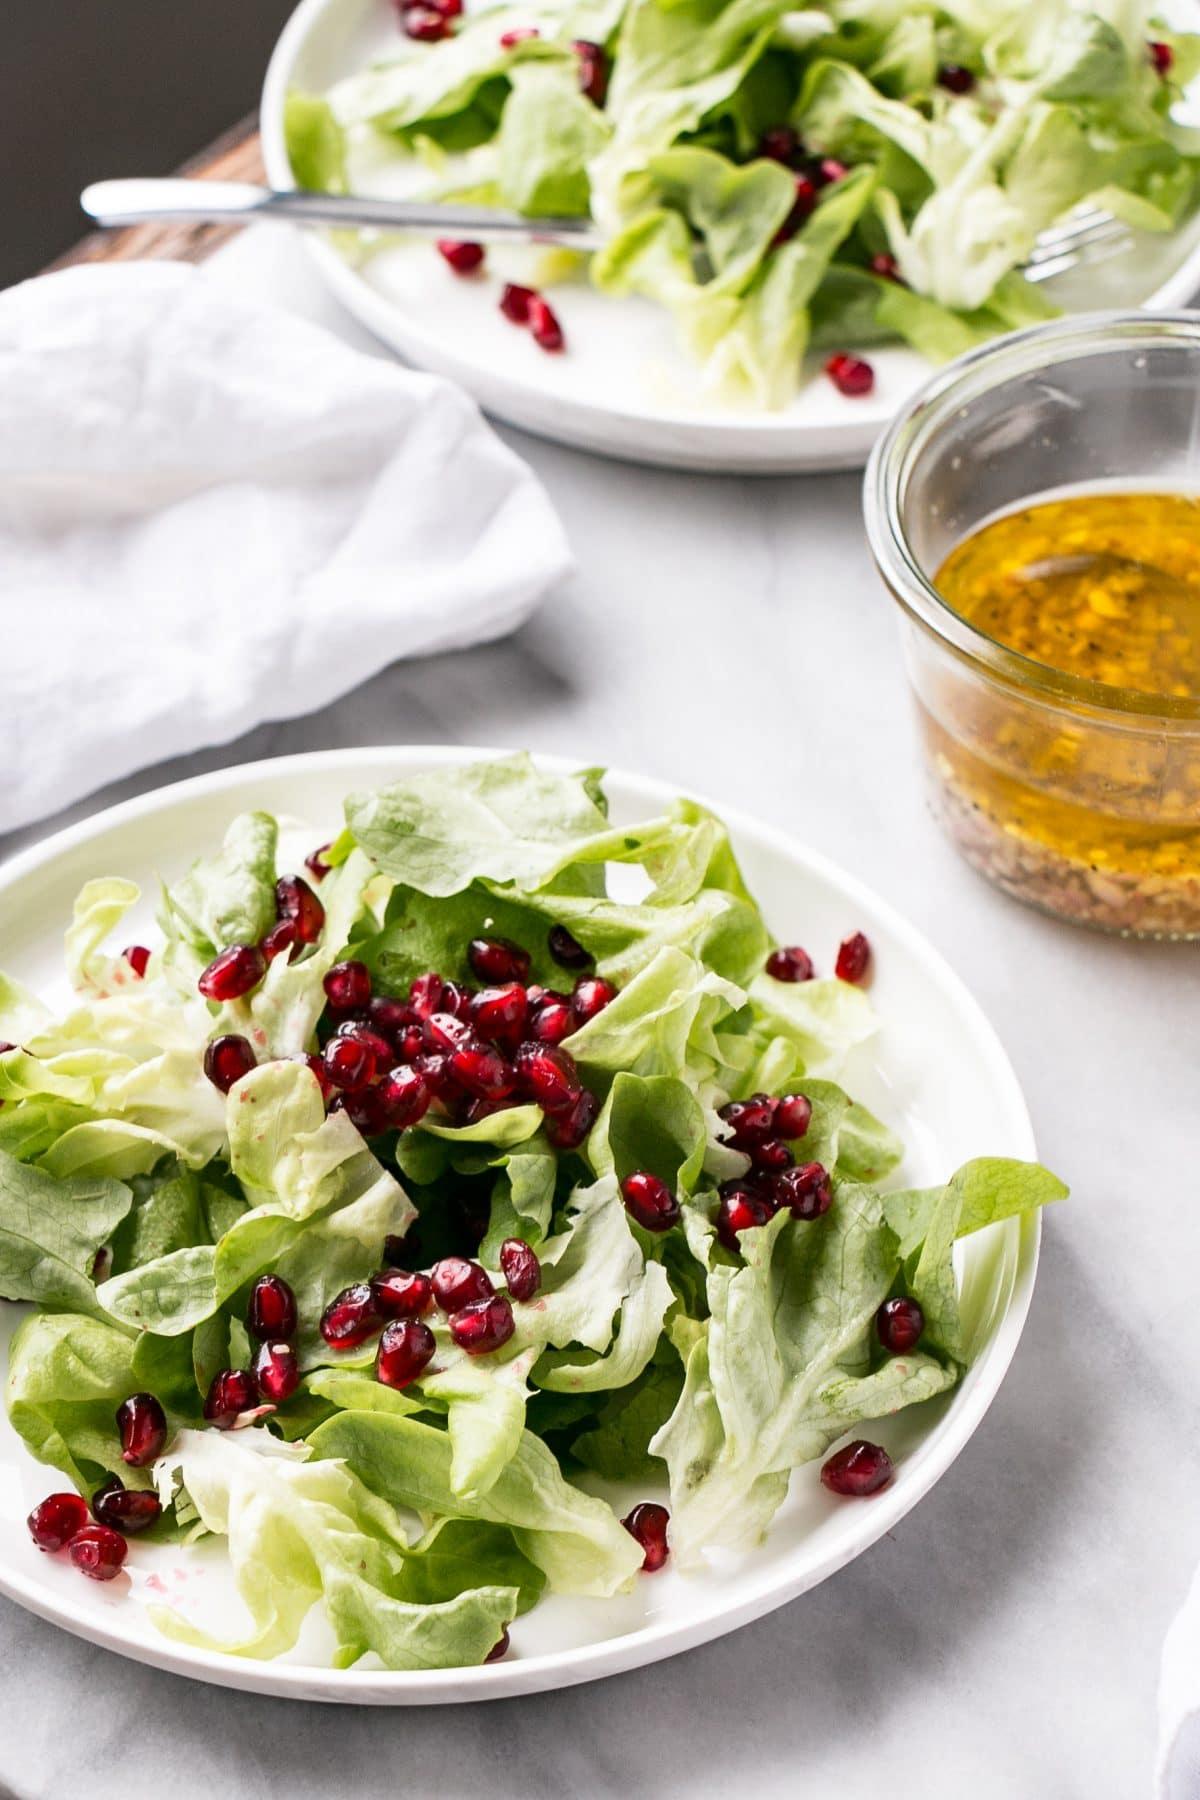 Christmas Salad Recipes.5 Ingredient Christmas Salad